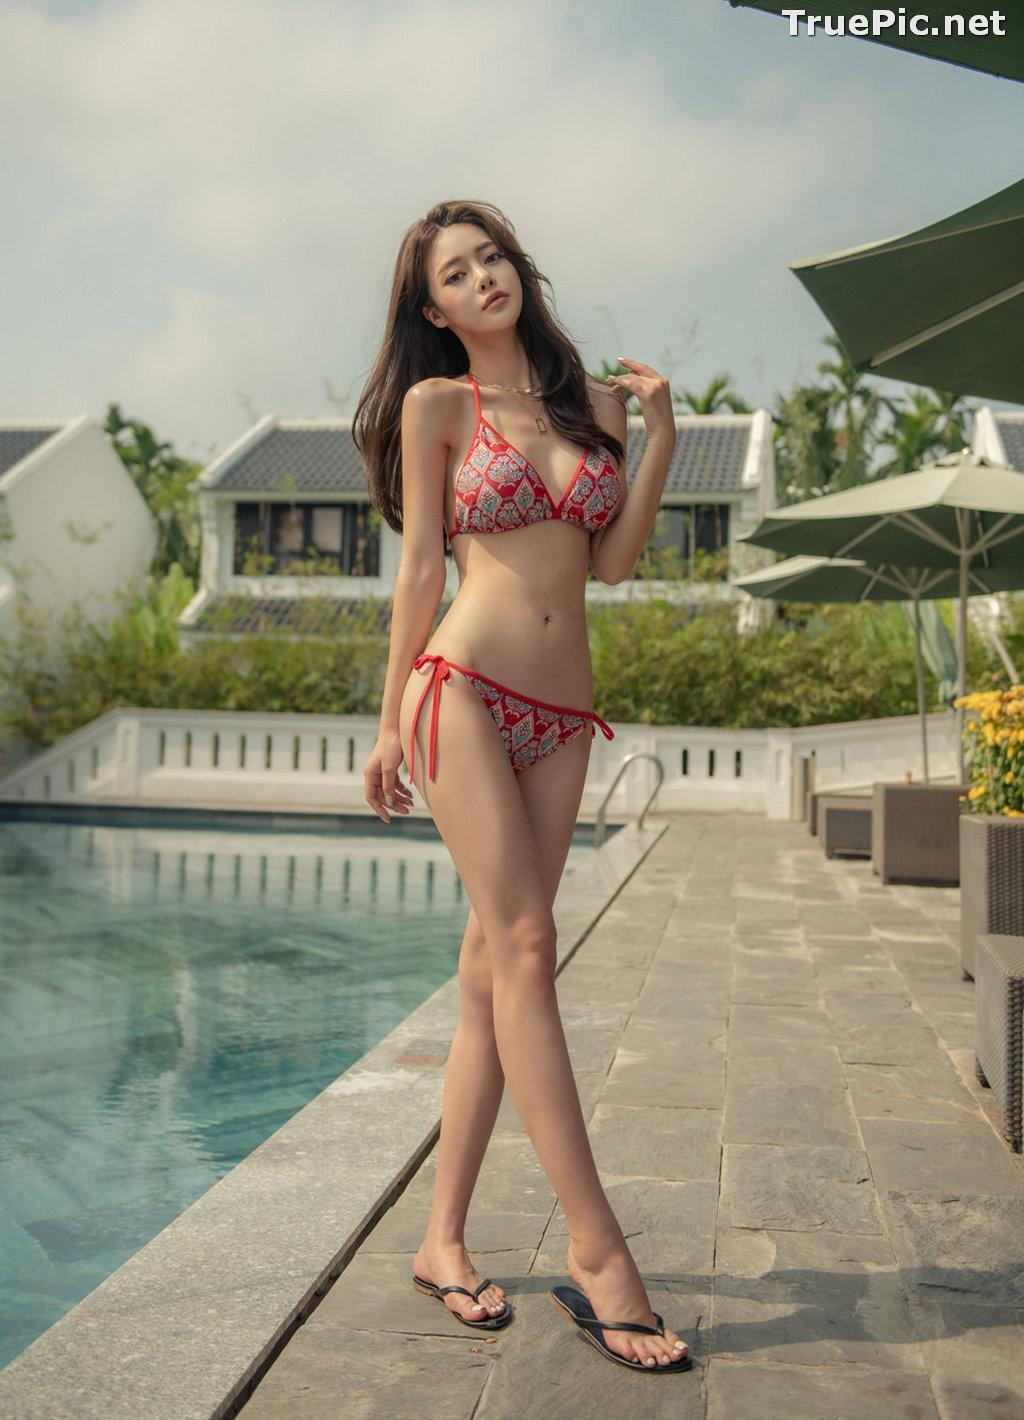 Image Korean Fashion Model - Kim Moon Hee - Hestia Slim Bikini - TruePic.net - Picture-7